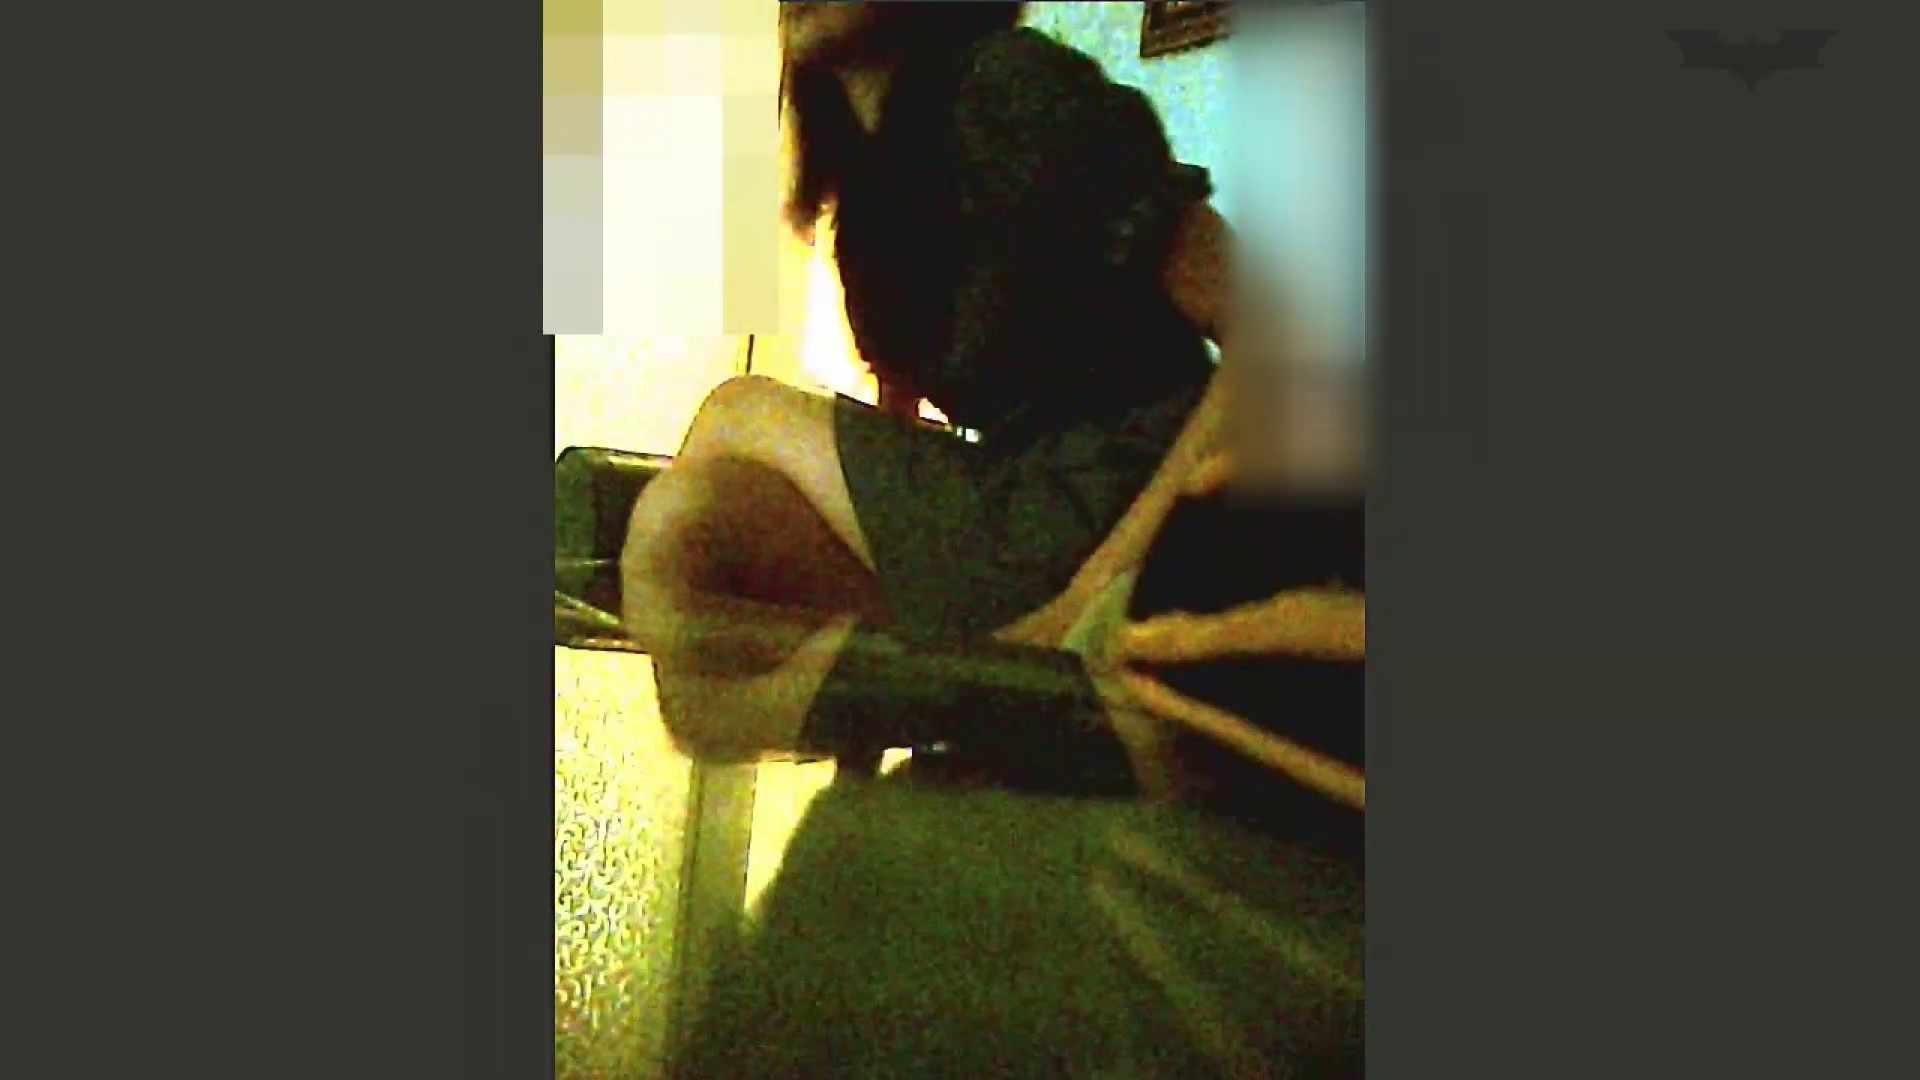 ▲2017_13位▲ 学園アイドル美人女子大生❷(下巻)5人詰合せVol.50 細身女性 戯れ無修正画像 70画像 6